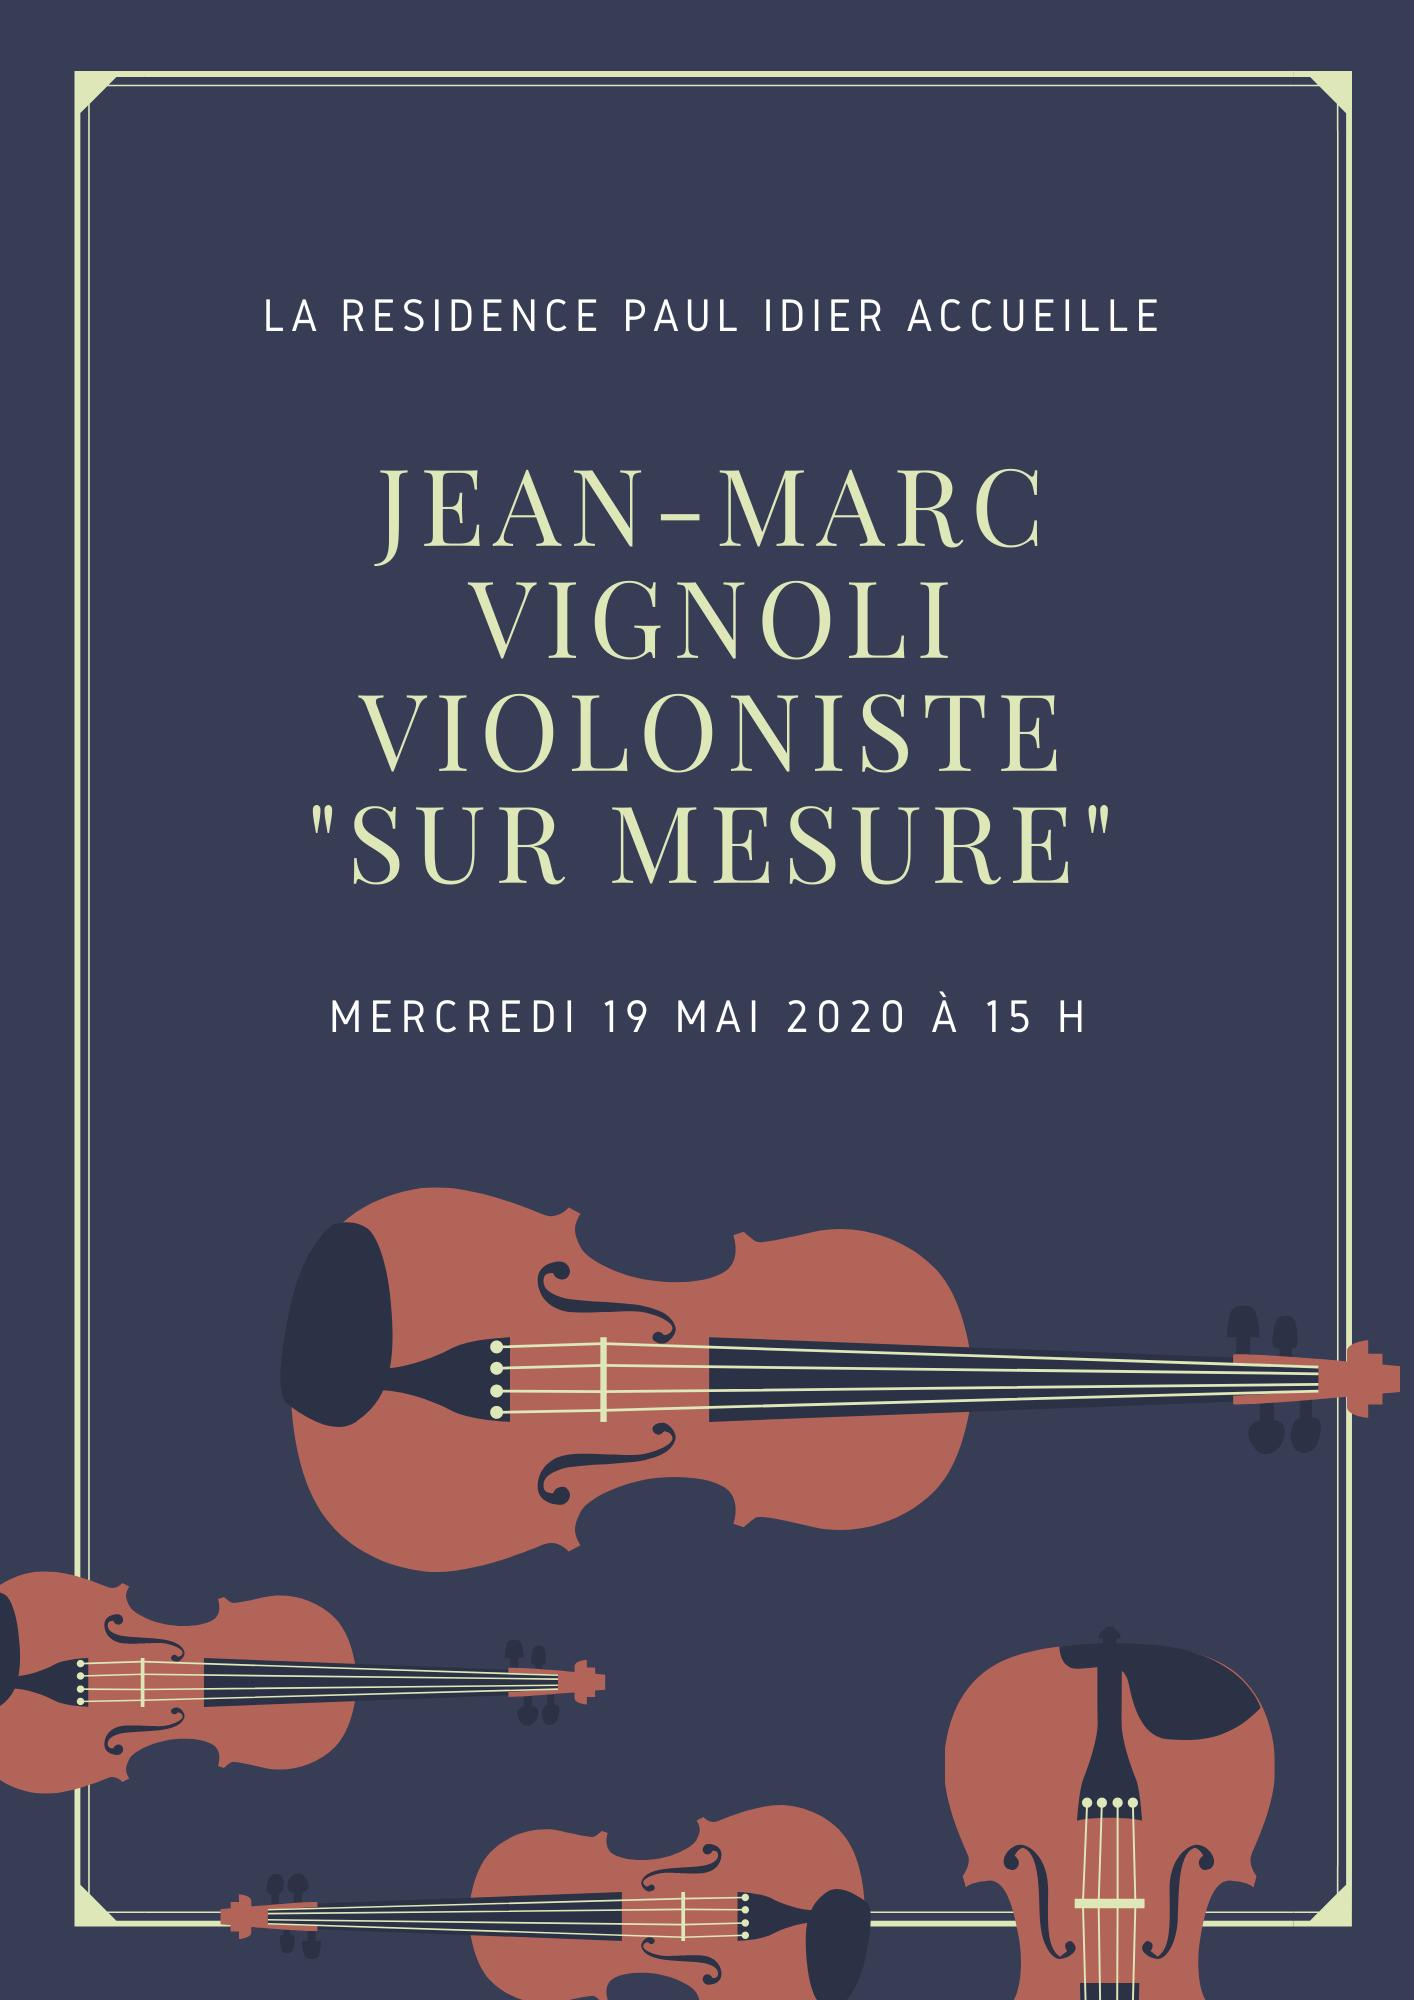 20210519 Jean-Marc Vignoli violoniste